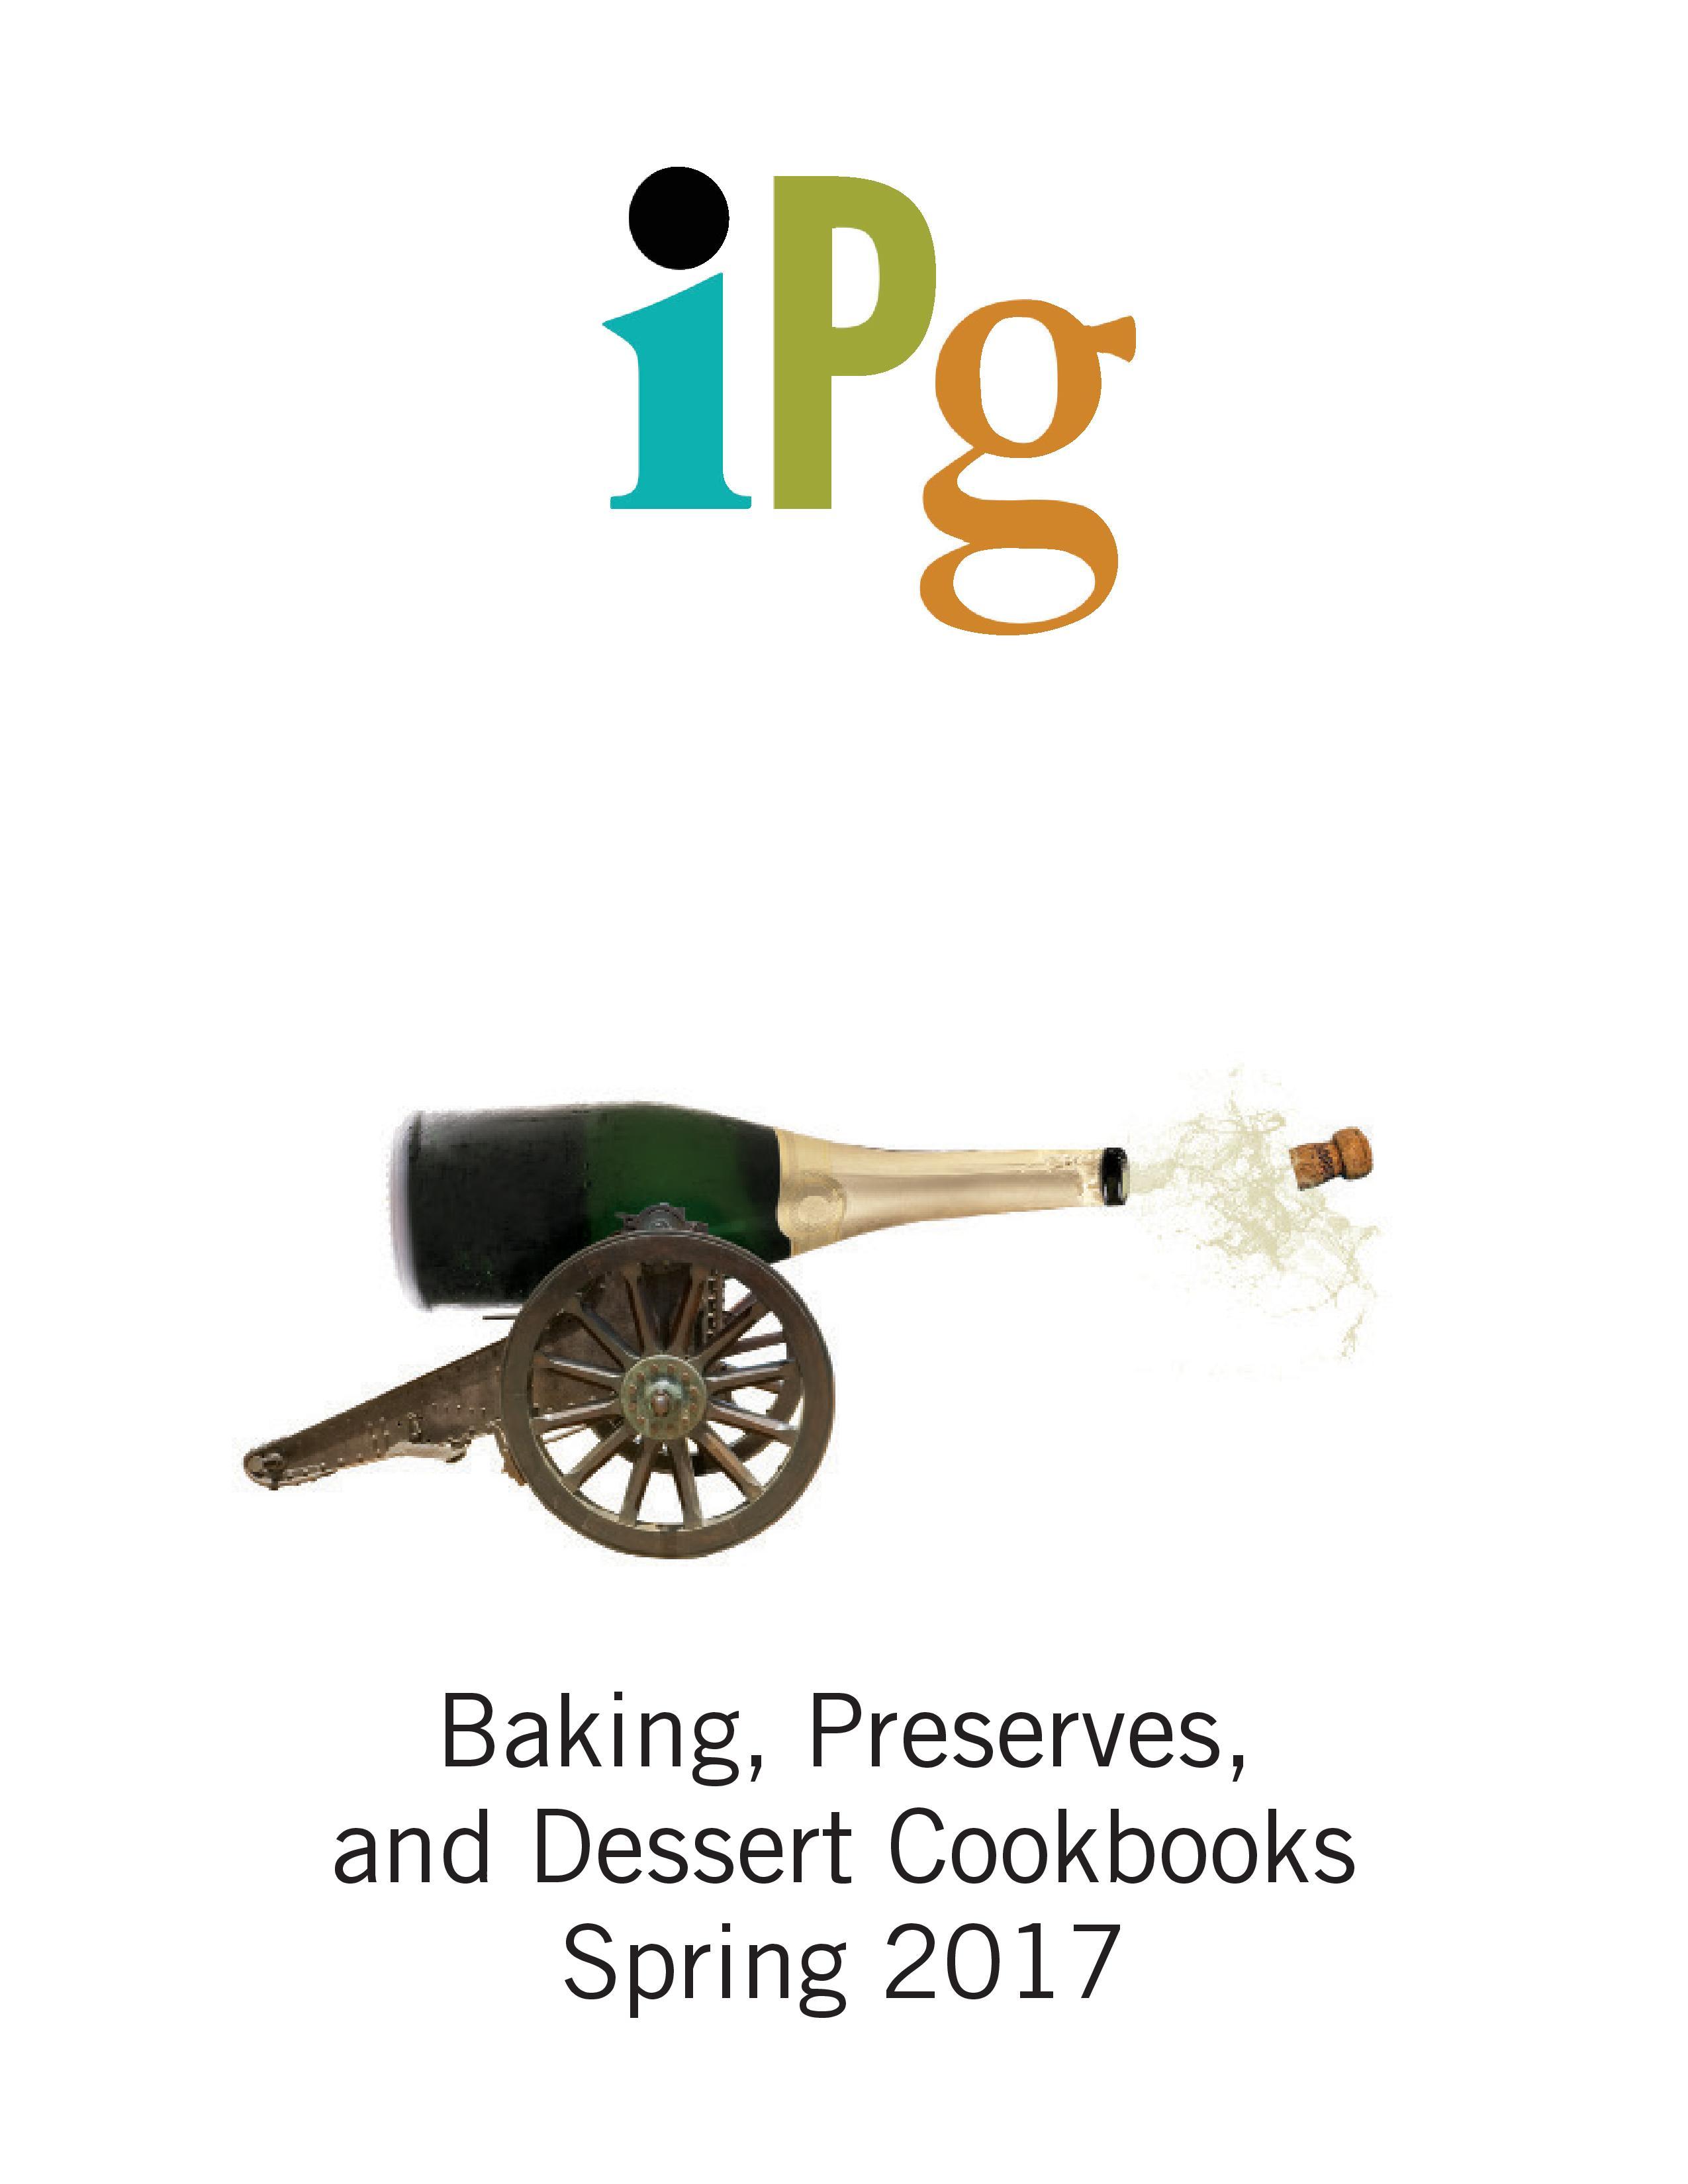 Baking, Preserves, and Dessert Titles